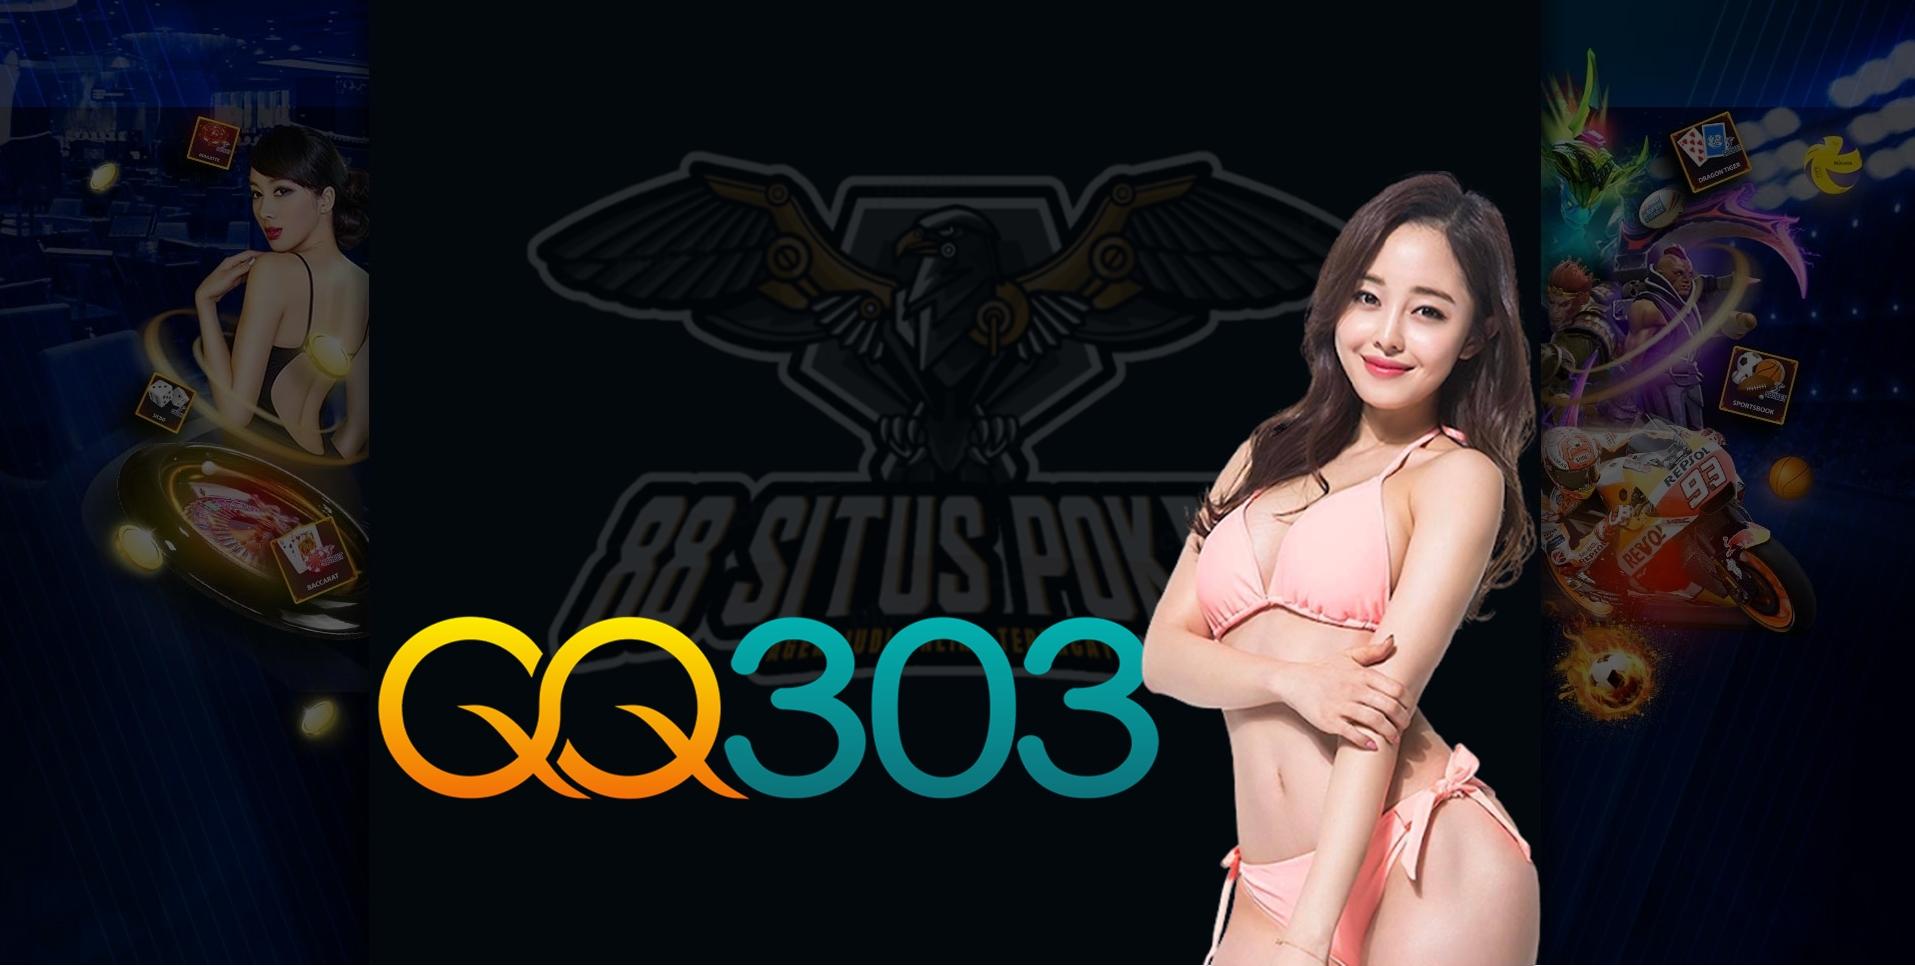 QQ303 situs slot online, judi online, casino online resmi di Indonesia